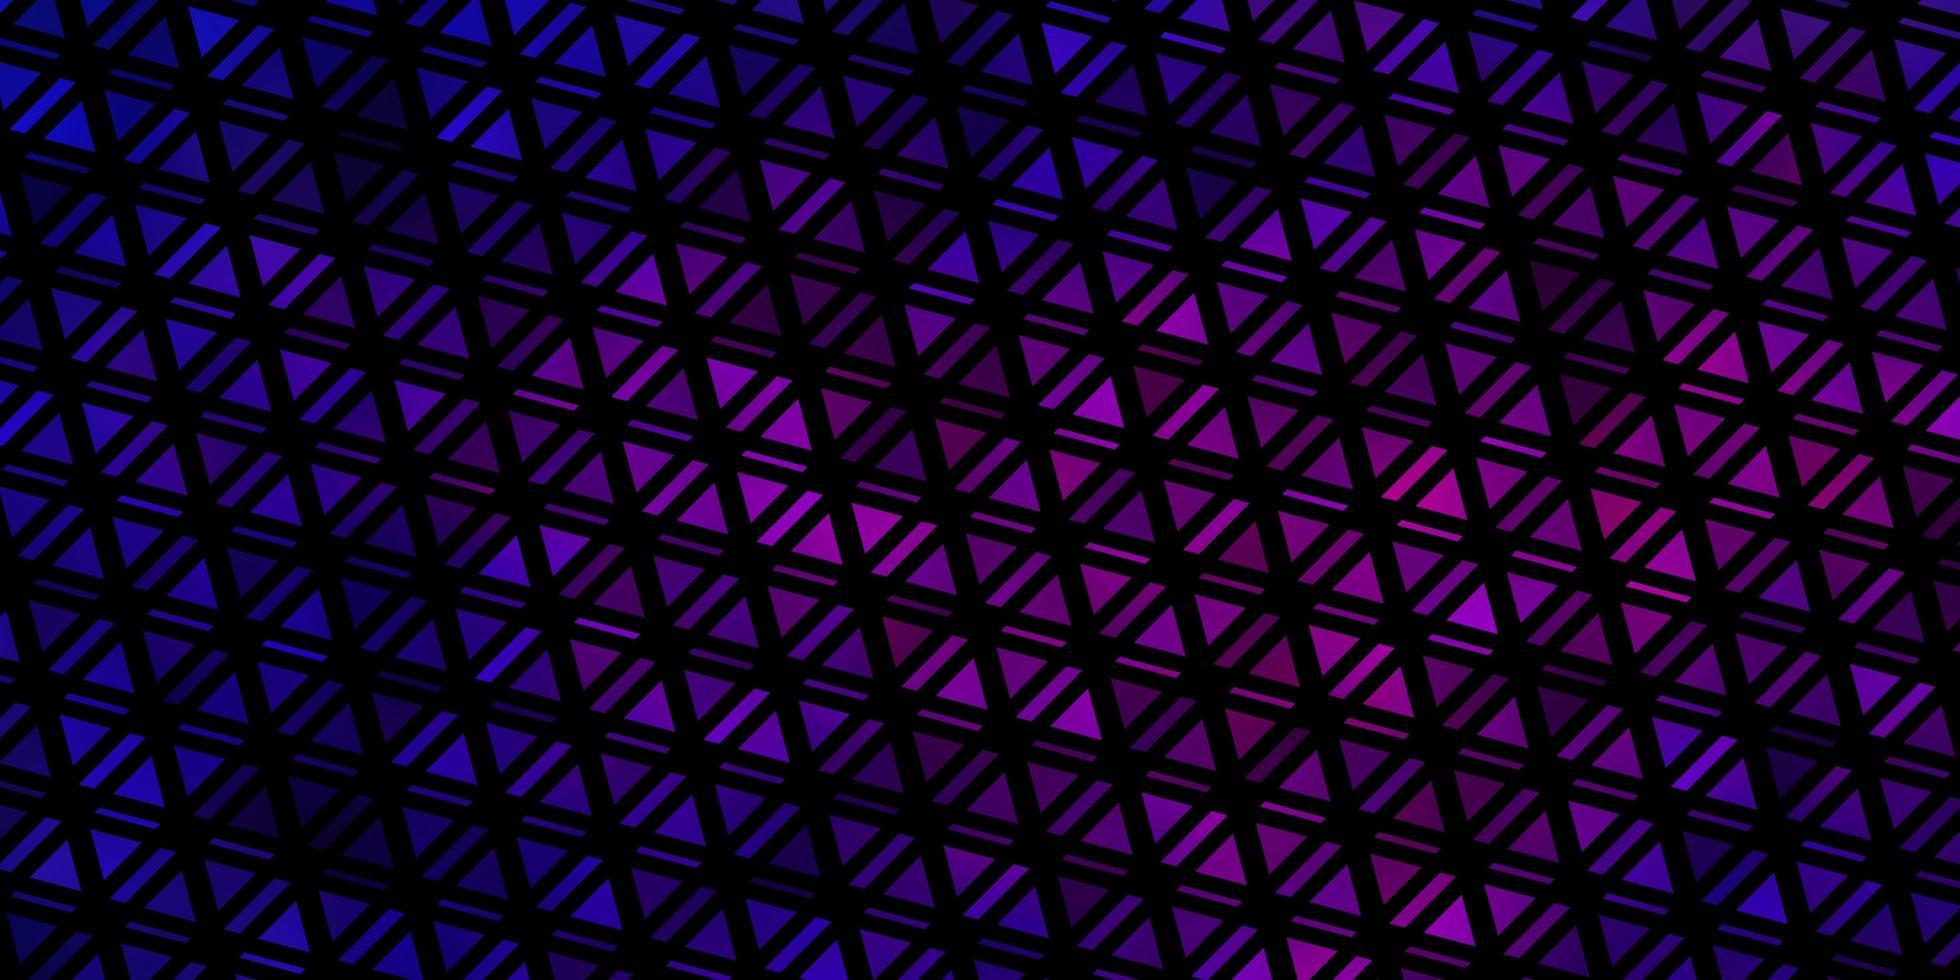 hellblaues, rotes Vektormuster mit polygonalem Stil. vektor